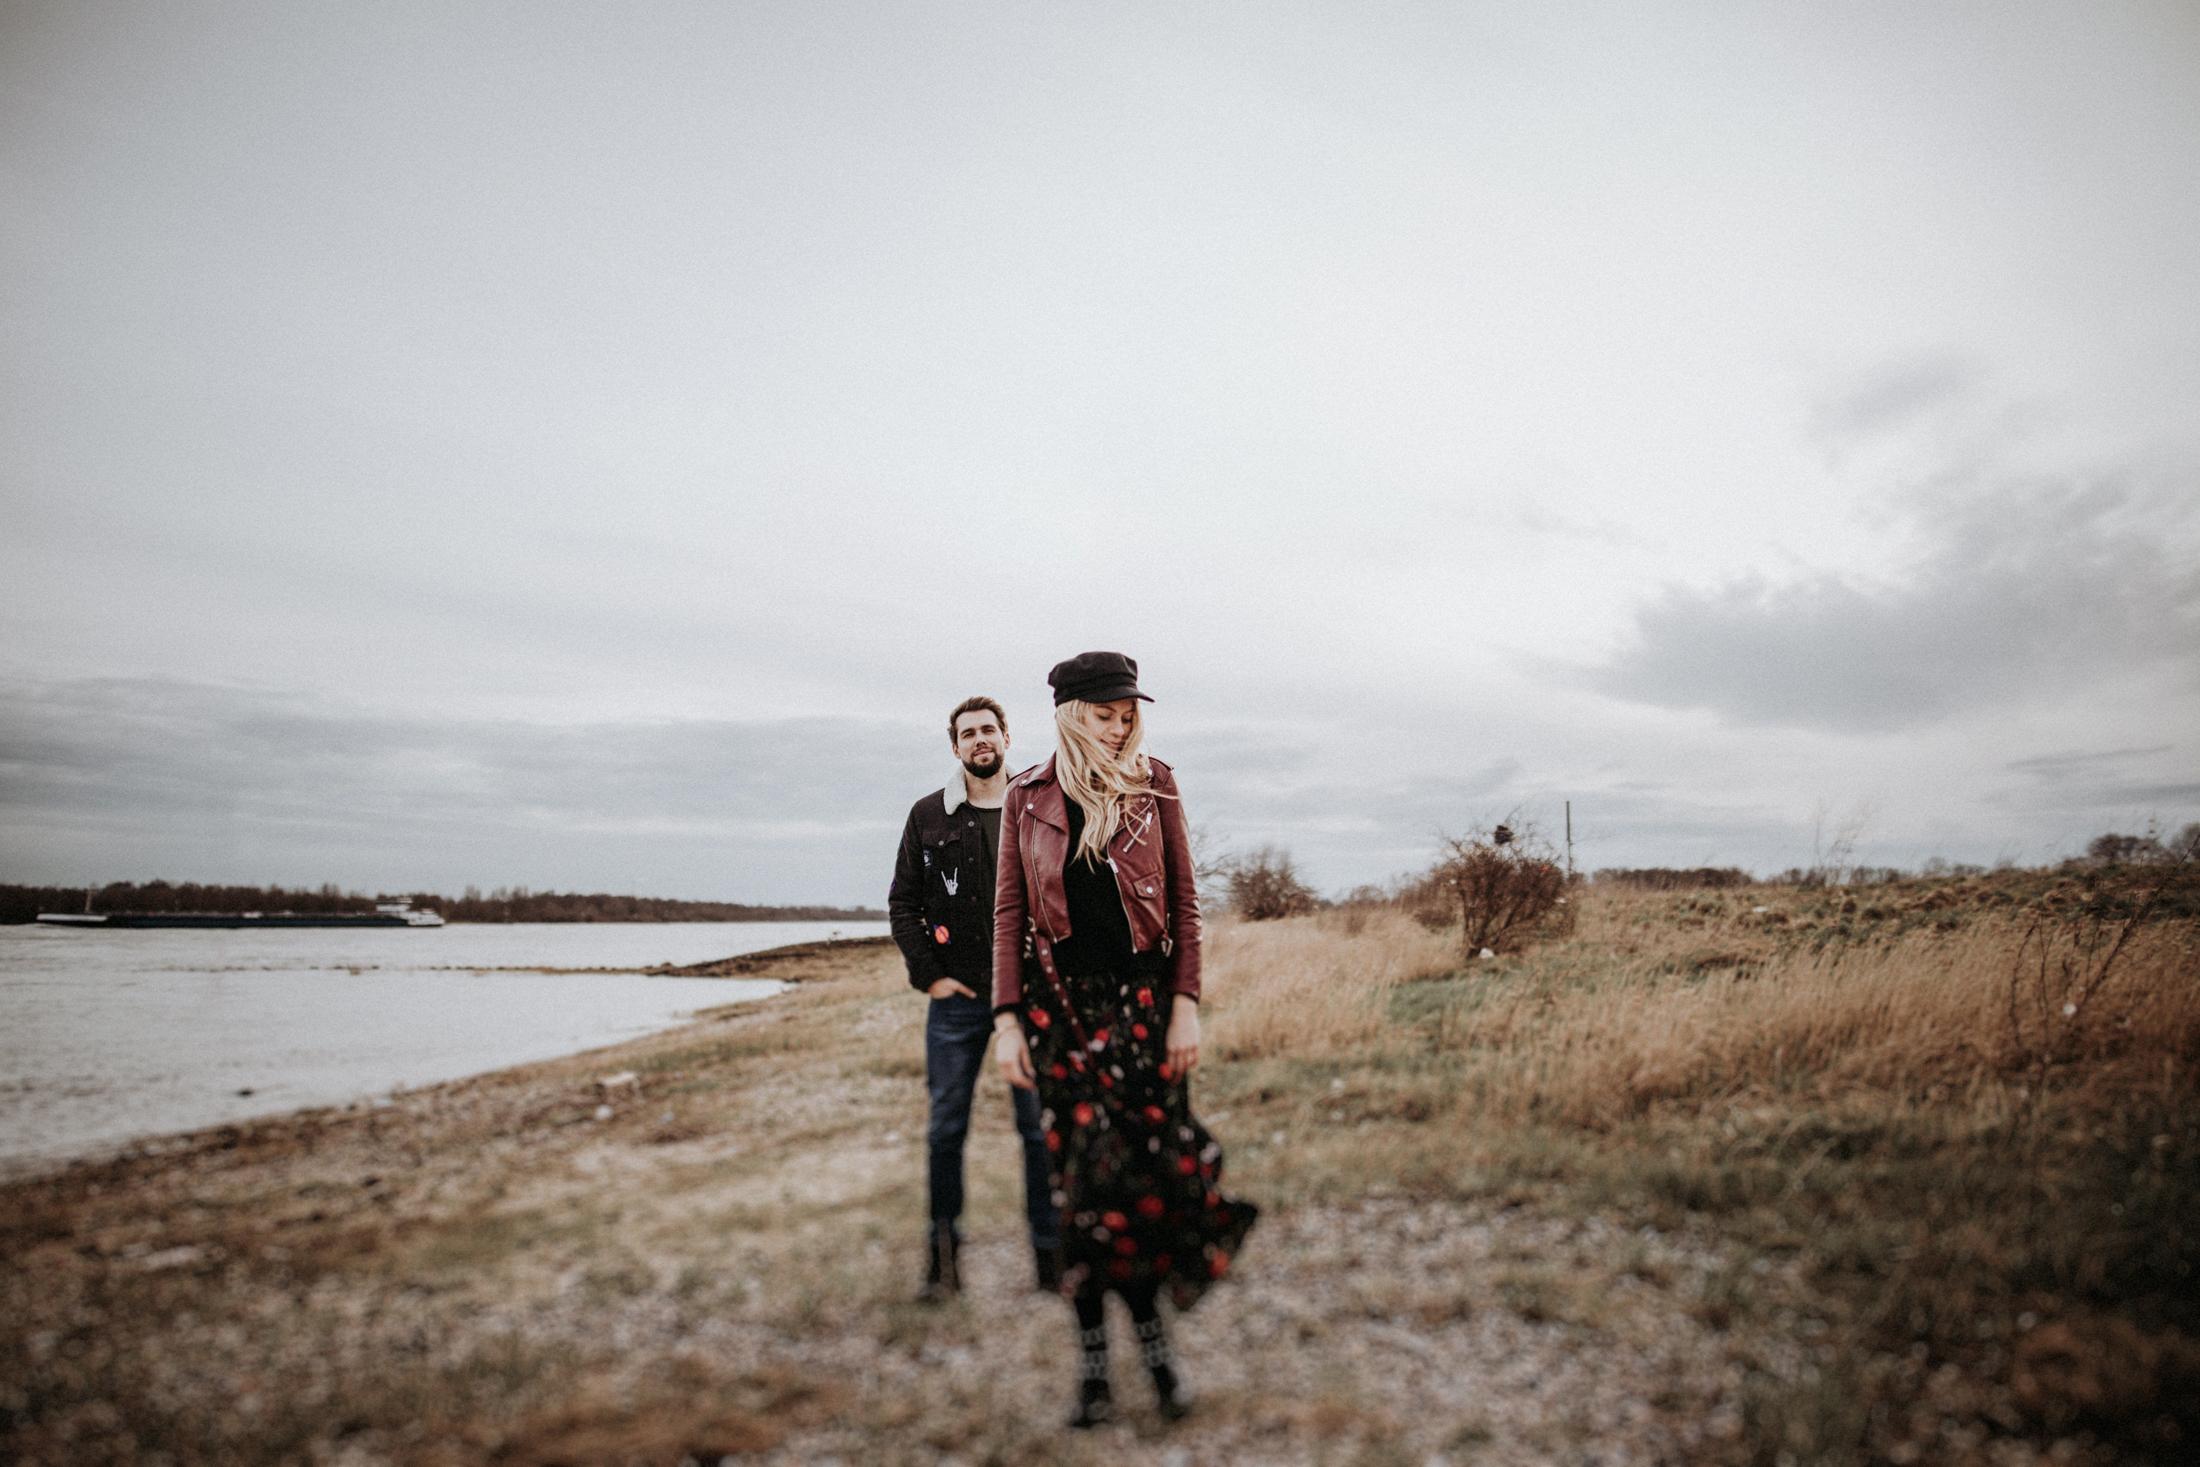 Wedding_Photographer_Mallorca_DanielaMarquardt_Photography_CanaryIslands_Lanzarote_Iceland_Tuscany_Santorini_Portugal_NewYork_Spain_Elopement_Hochzeitsfotograf_CK106